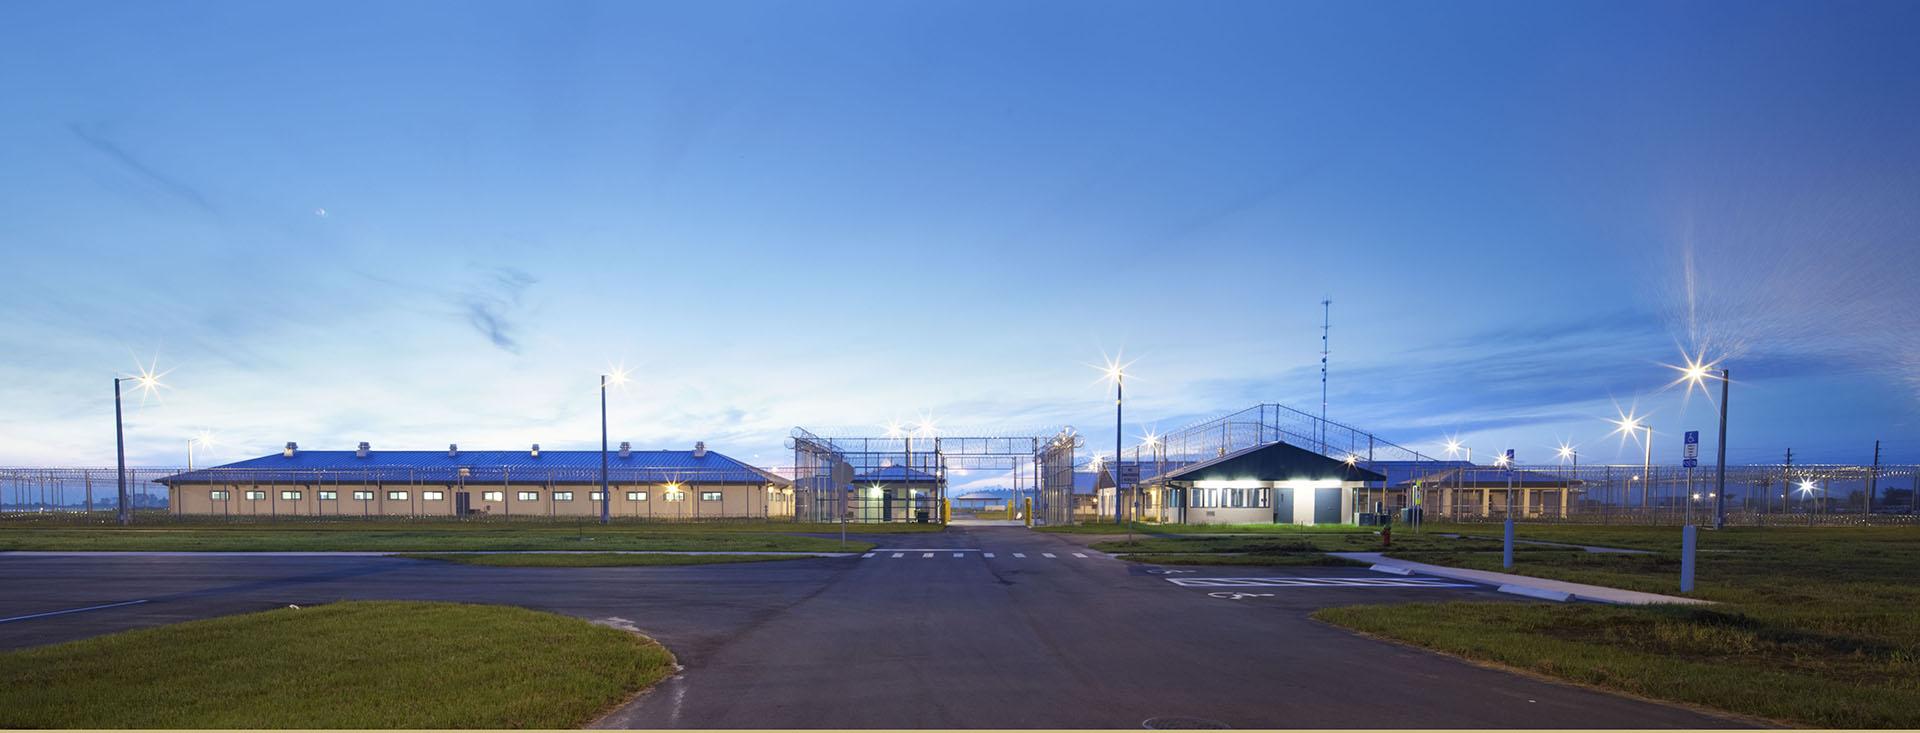 Okeechobee Correctional Institution Work Camp Moss Cm